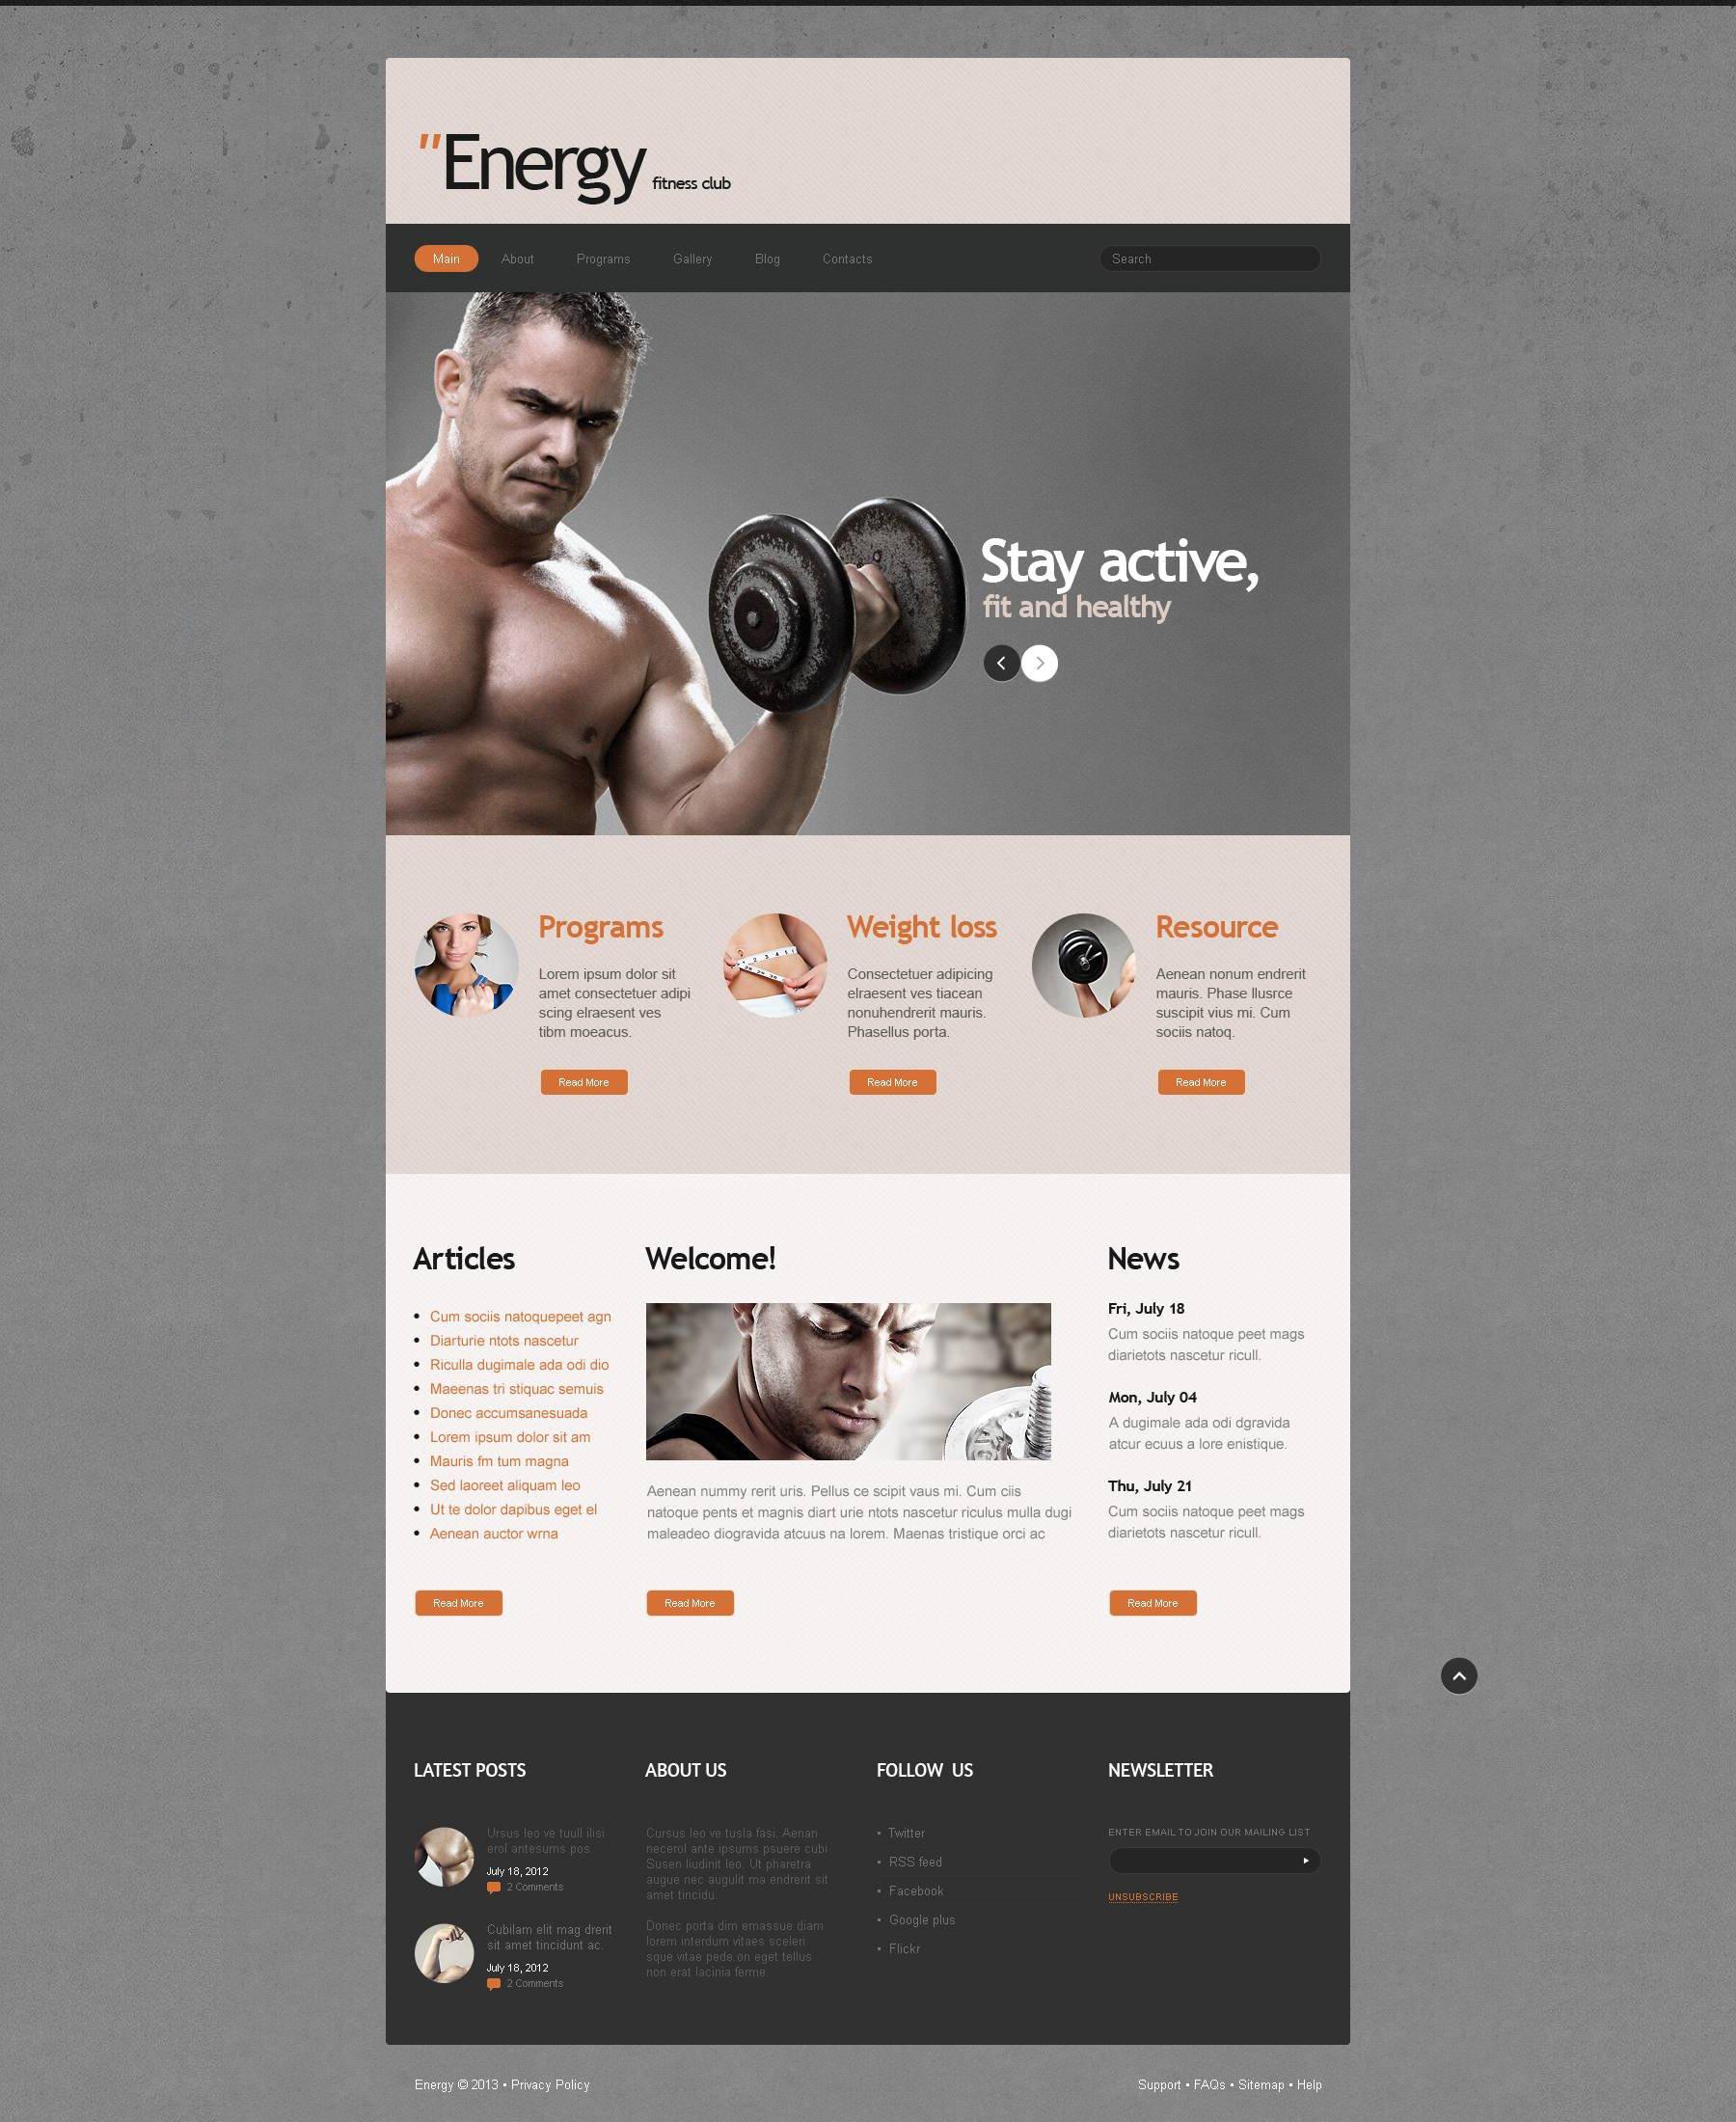 Plantilla Joomla Responsive para Sitio de Fitness #45337 - captura de pantalla